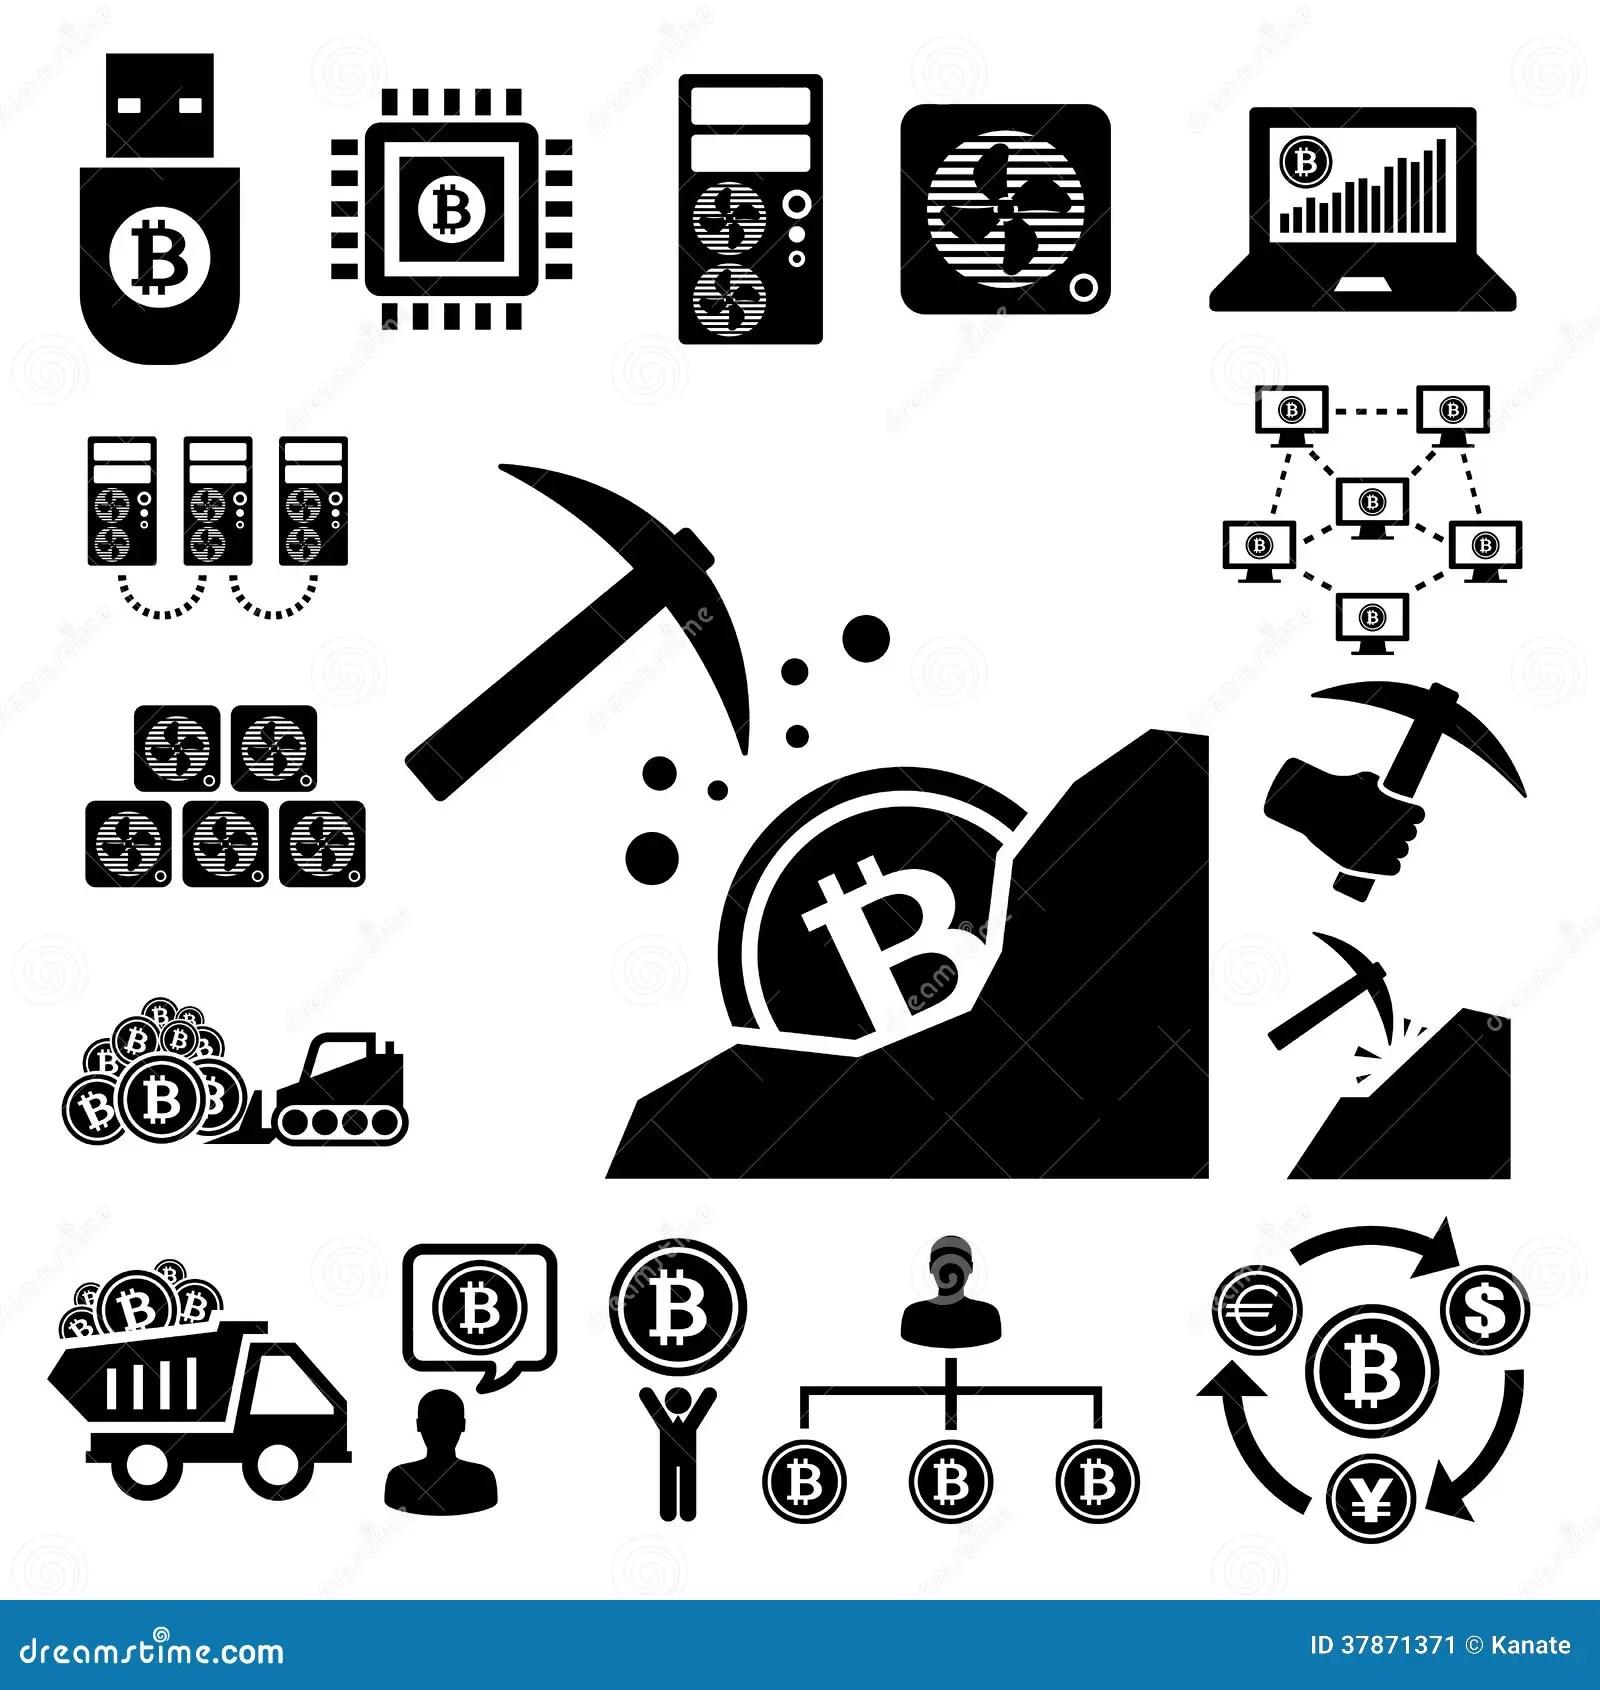 Bitcoin Icons Set Stock Image